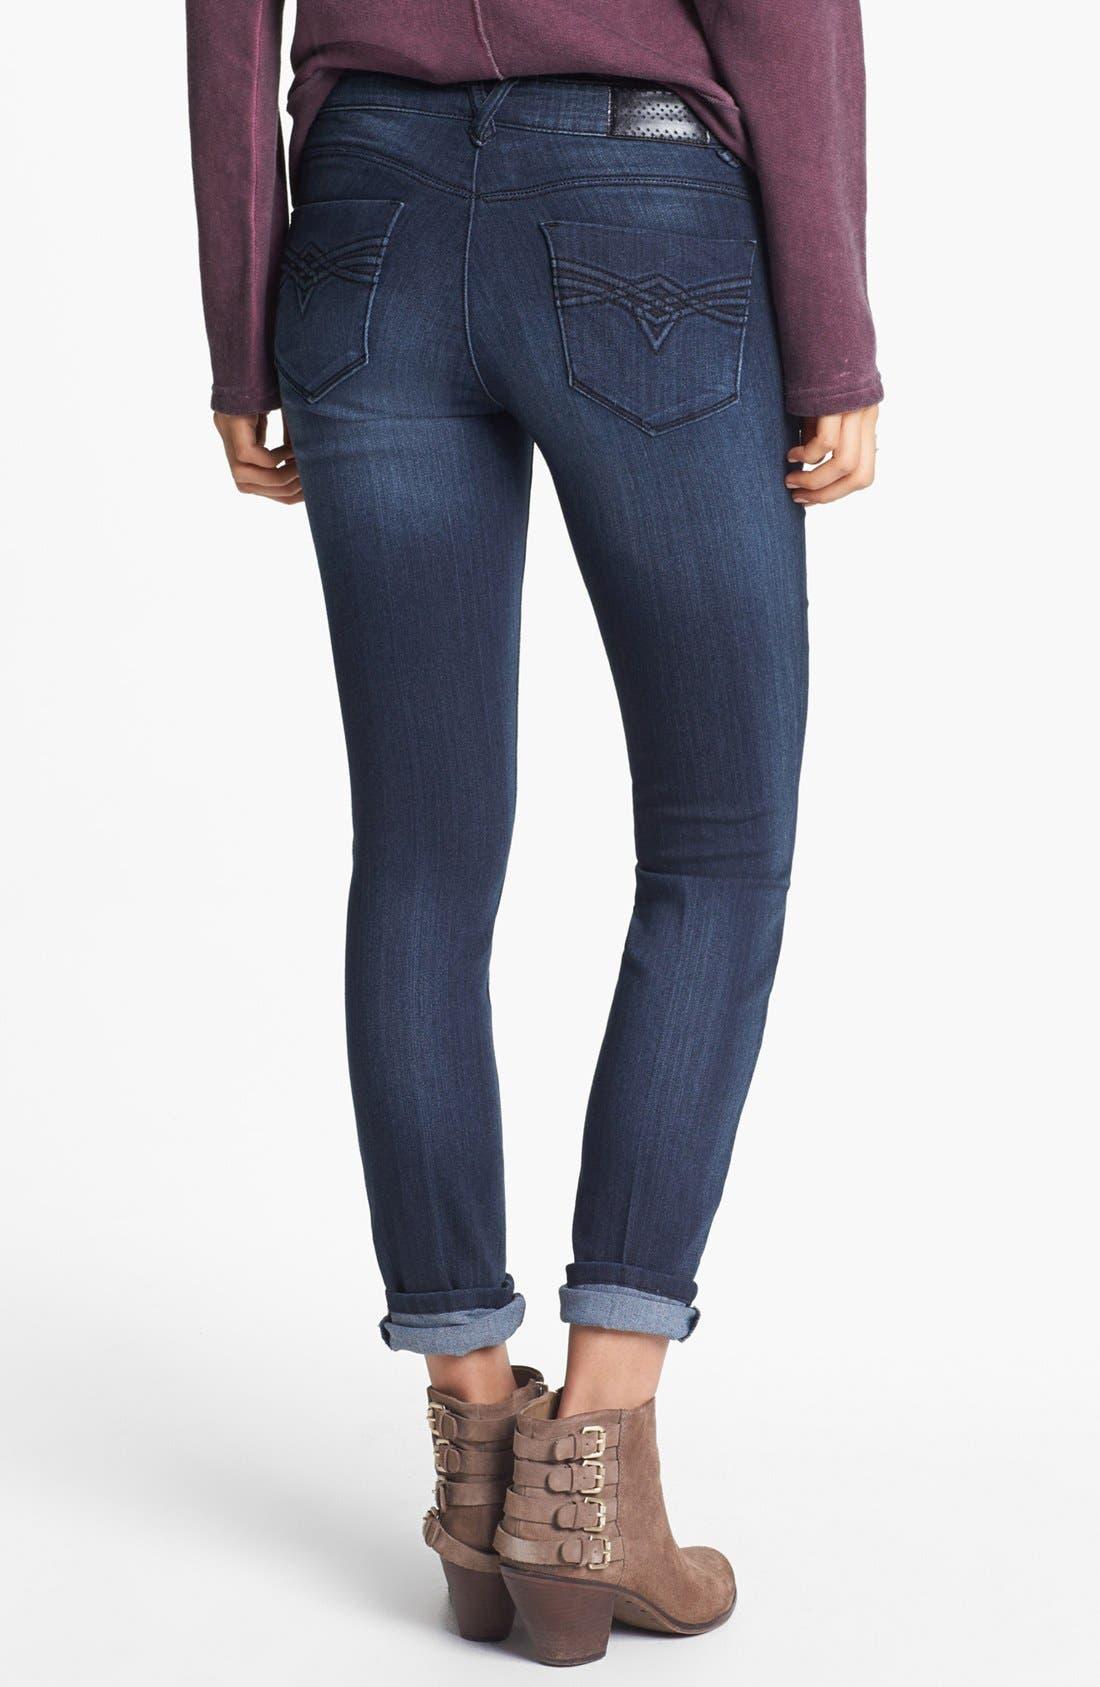 Alternate Image 1 Selected - Jolt 'Aircord' Embroidered Pocket Skinny Jeans (Dark) (Juniors)